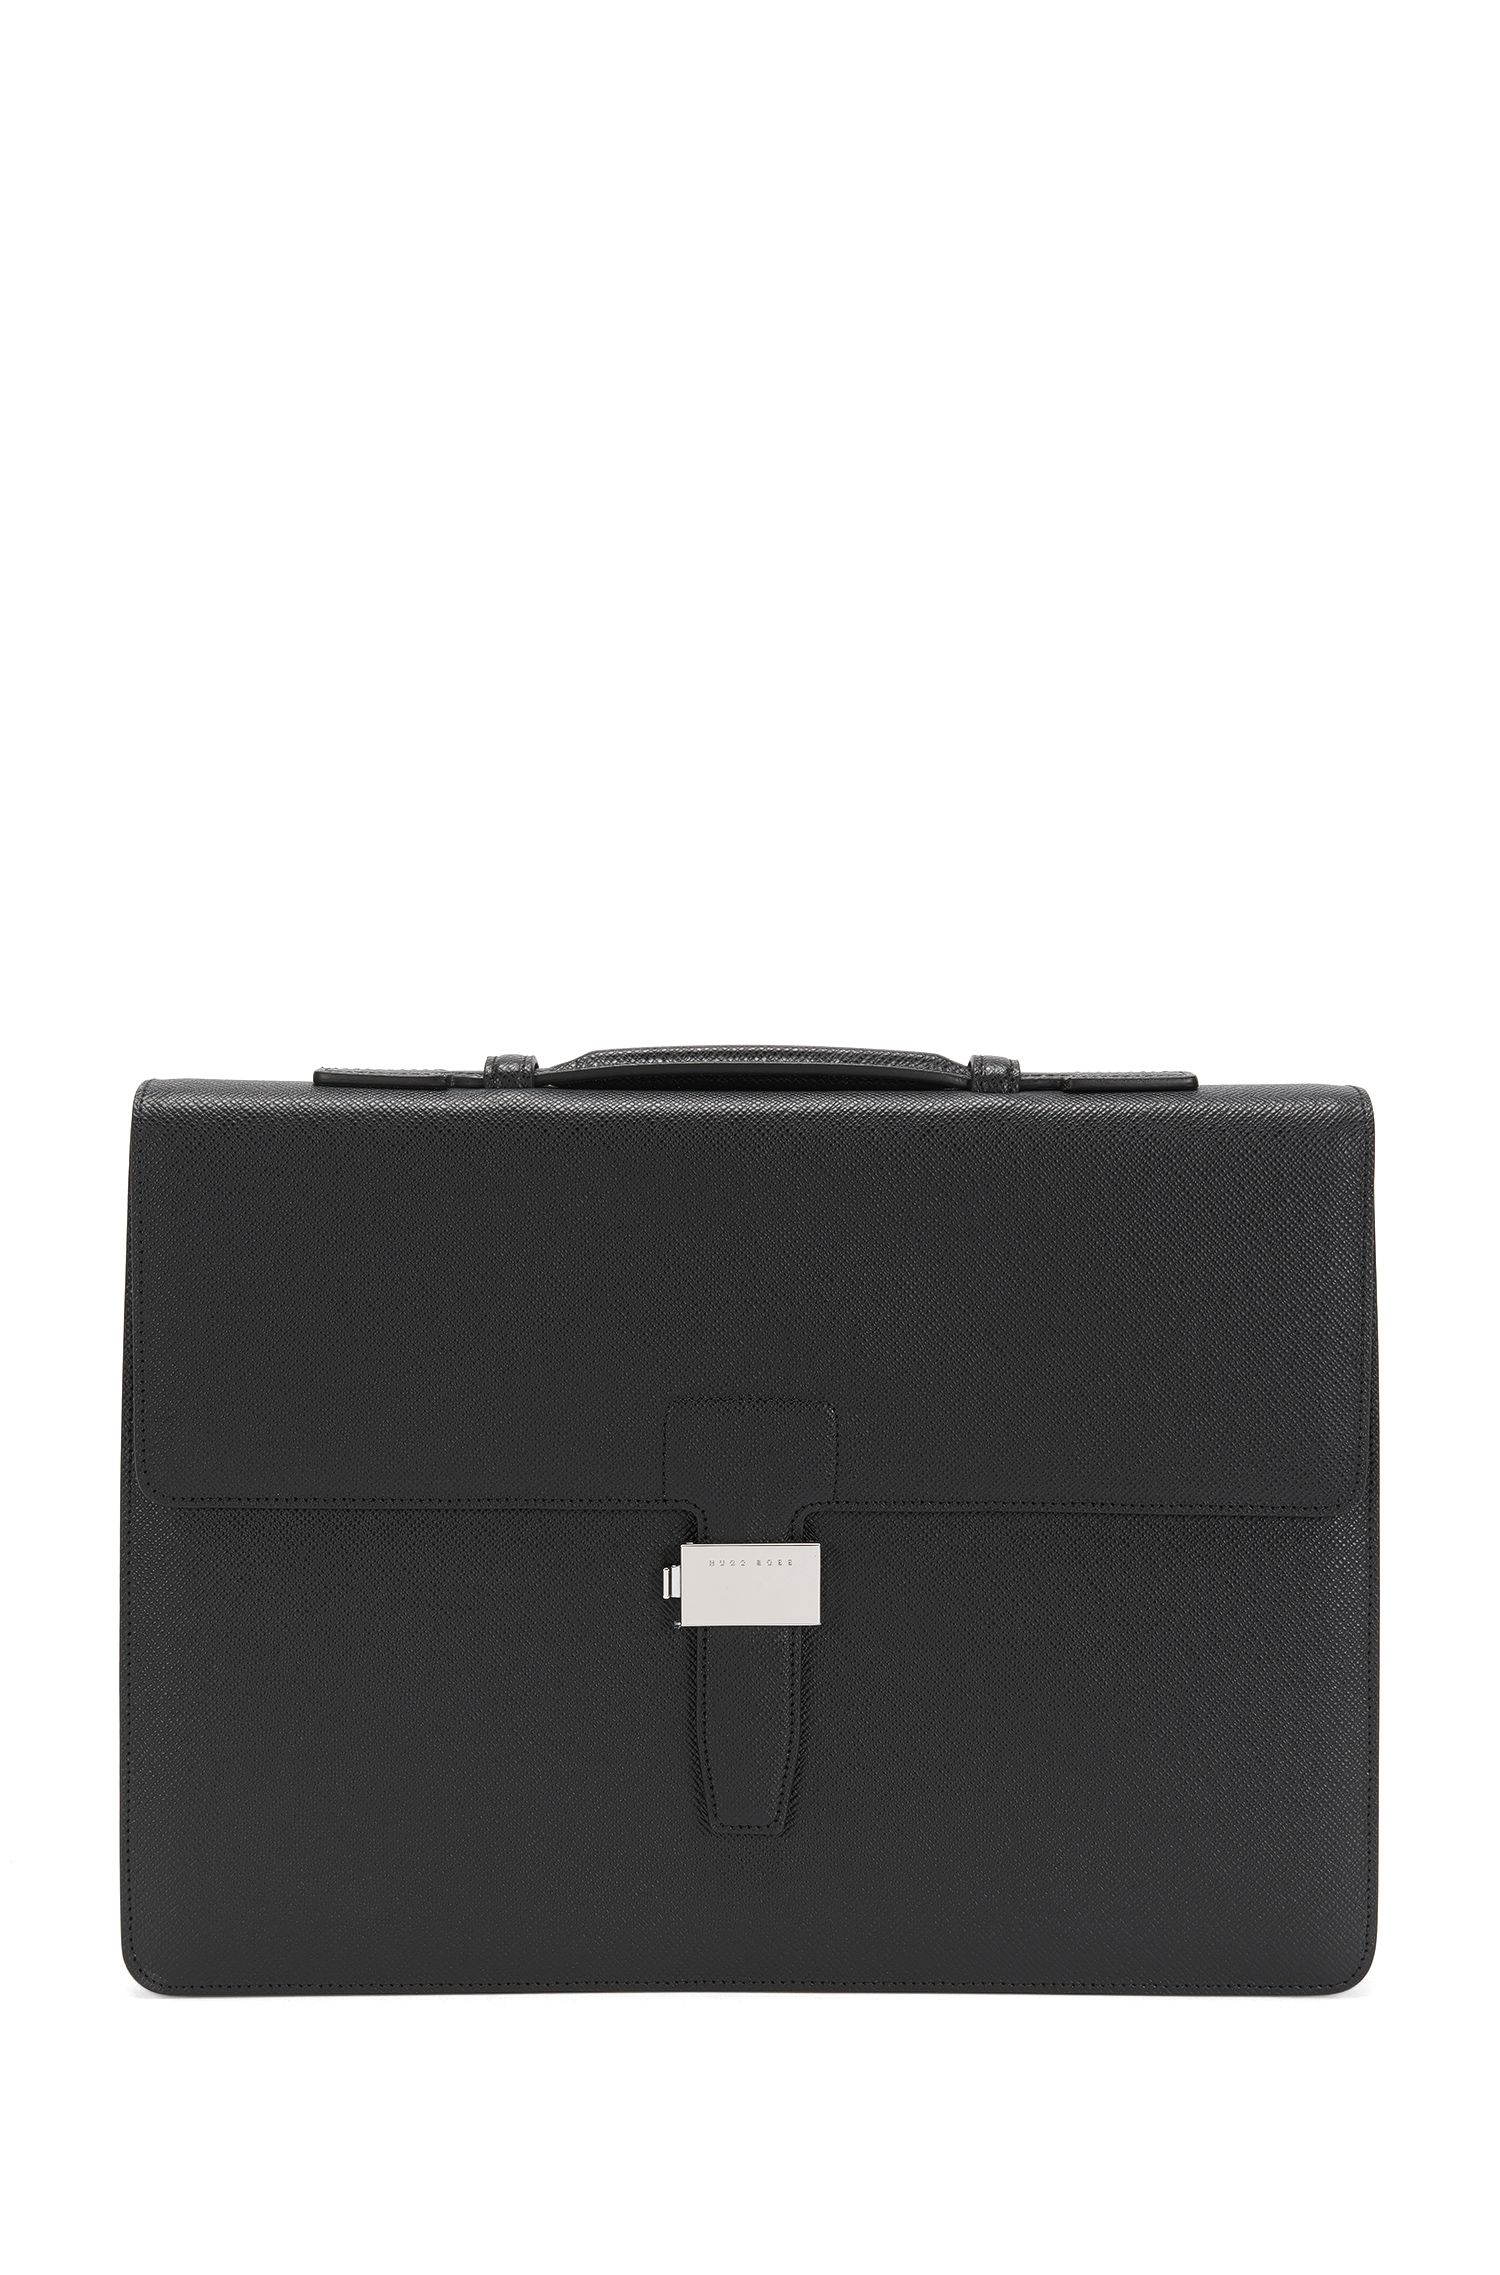 Leather Briefcase | Signature Brief SN